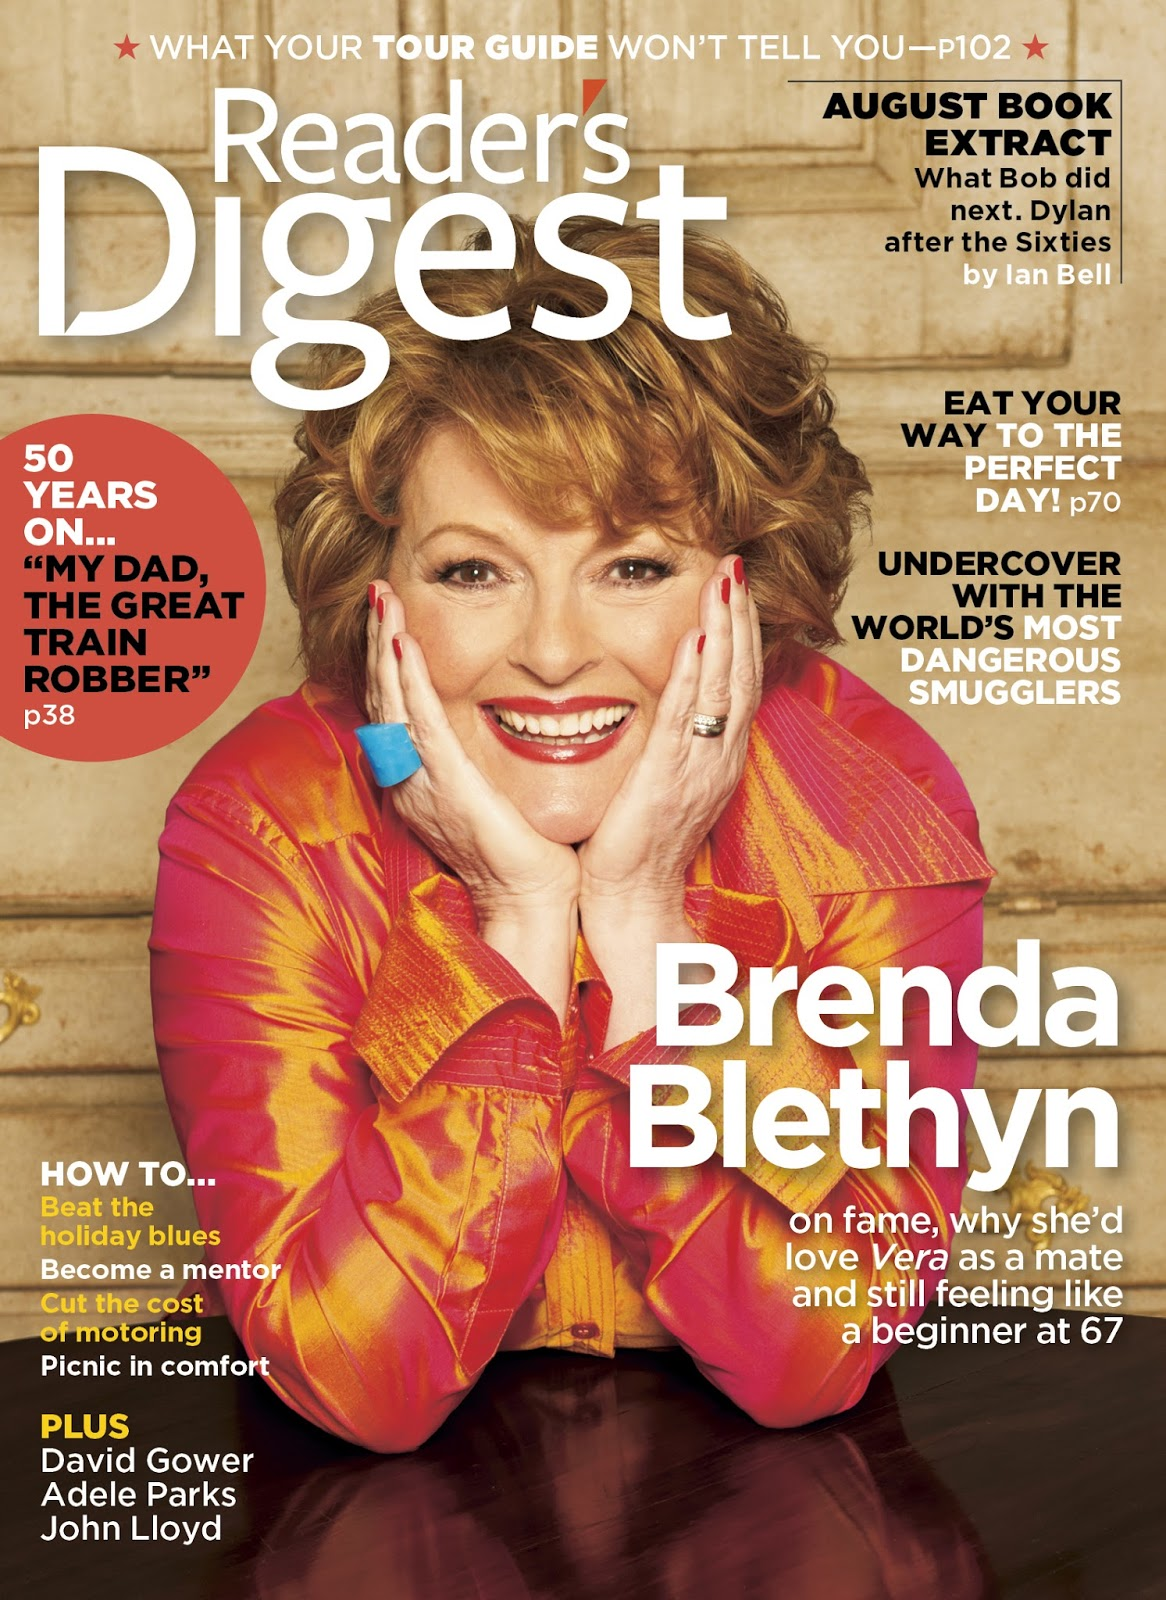 Brenda Blethyn's quote #3